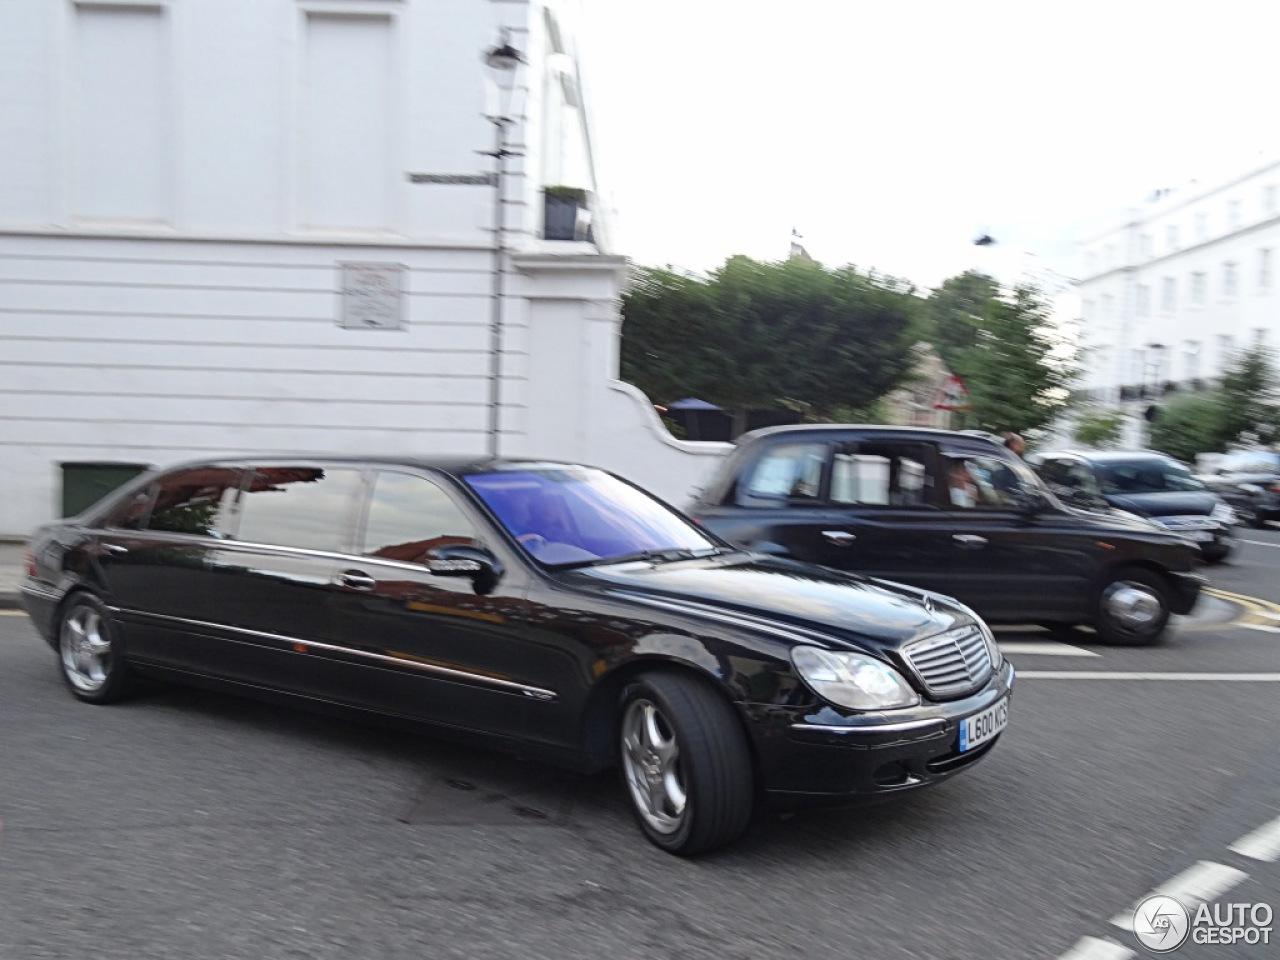 Mercedes-Benz S 600 Pullman - 10 August 2013 - Autogespot Мерседес S600 2012